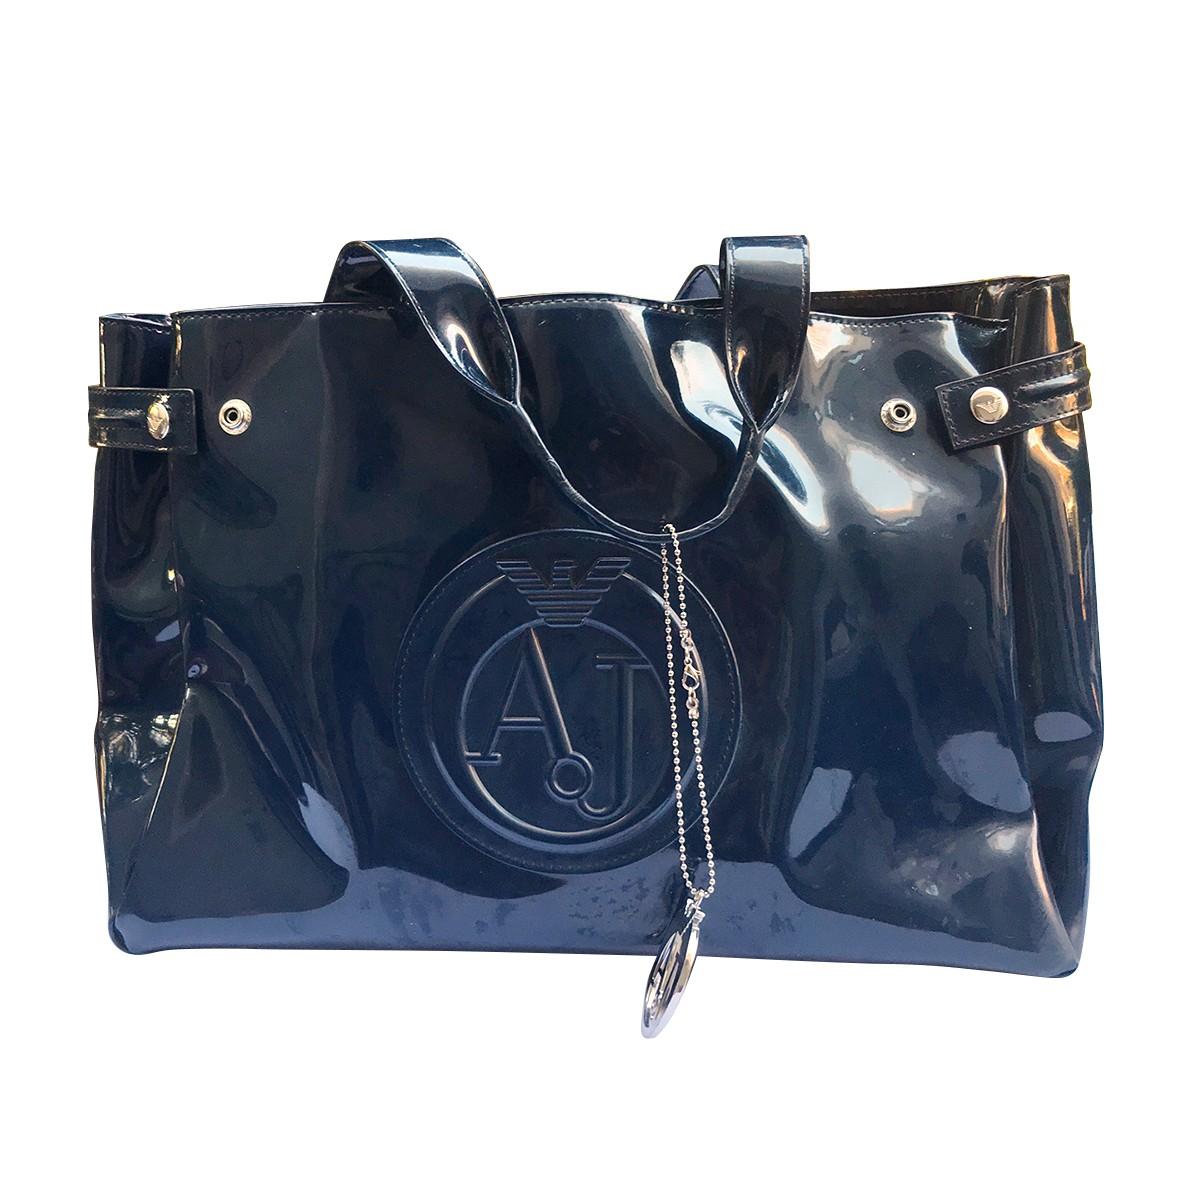 843b64fdf915 Armani Jeans Handbag - Women